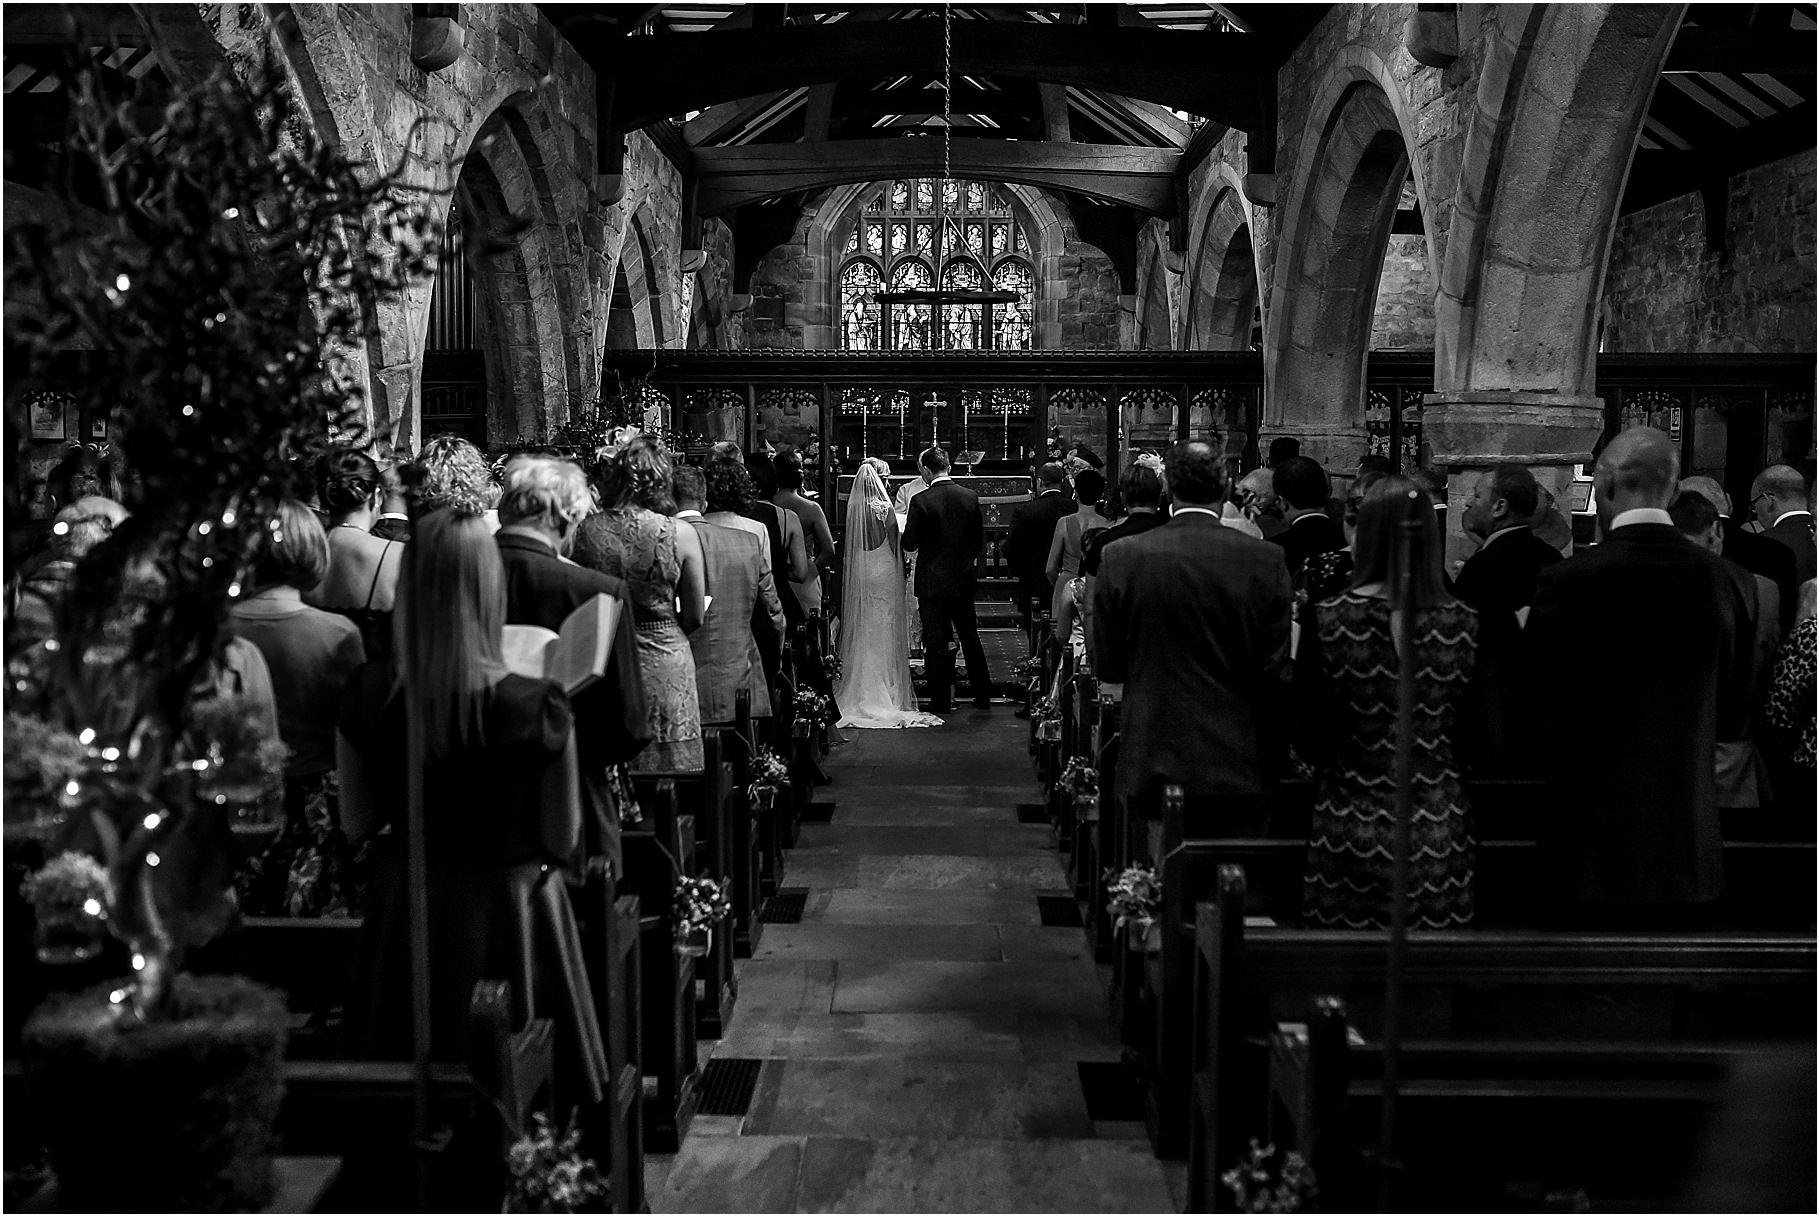 bartle-hall-wedding-photography-035.jpg